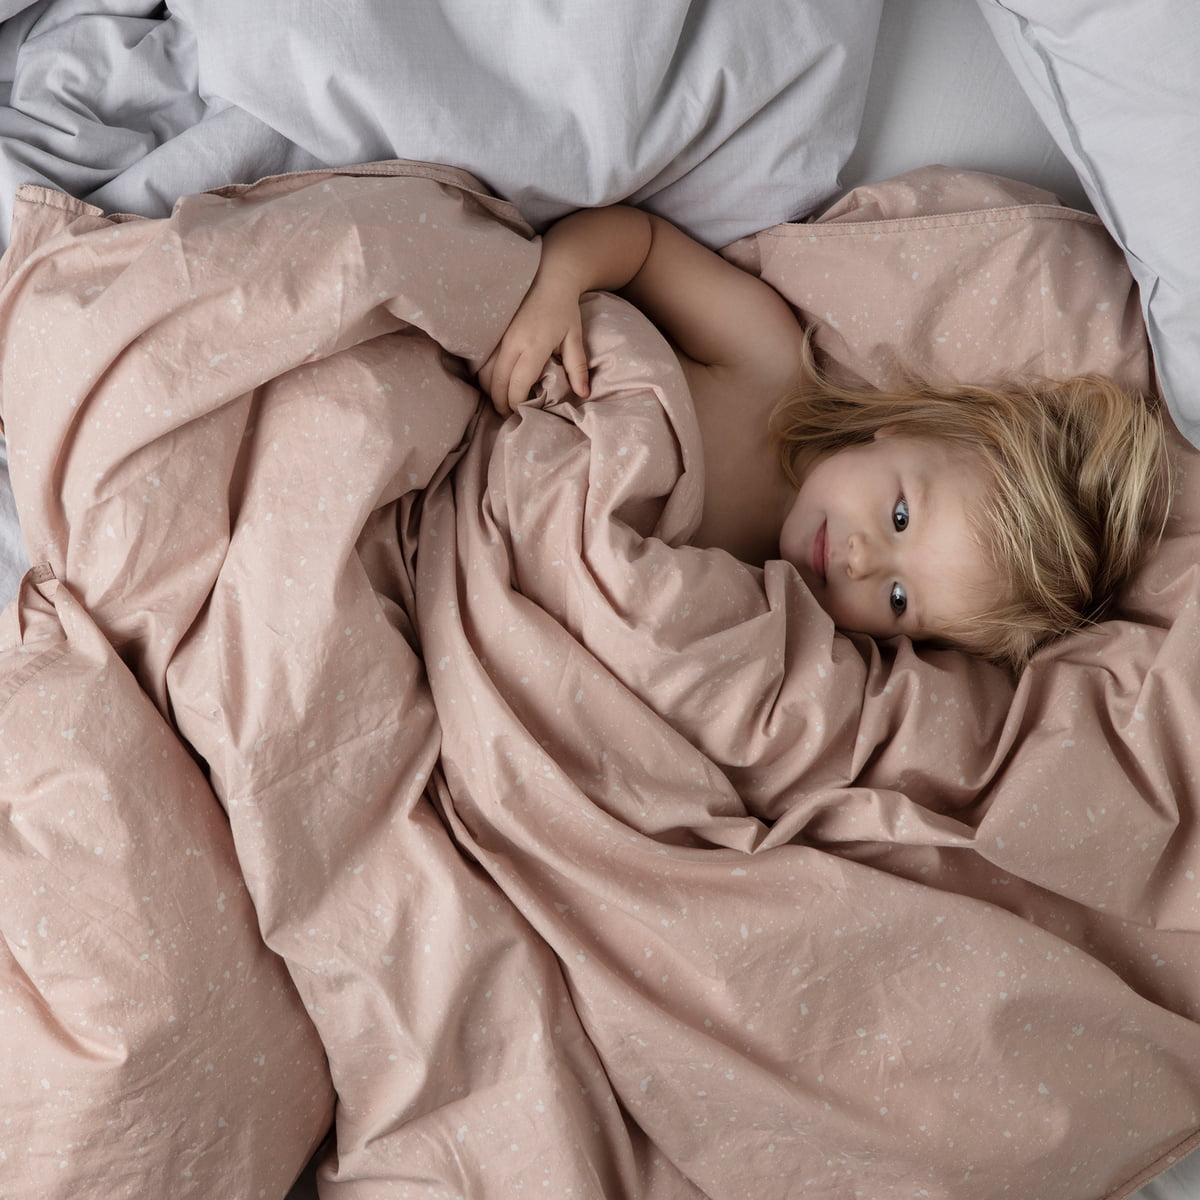 hush bedding by ferm living connox shop. Black Bedroom Furniture Sets. Home Design Ideas